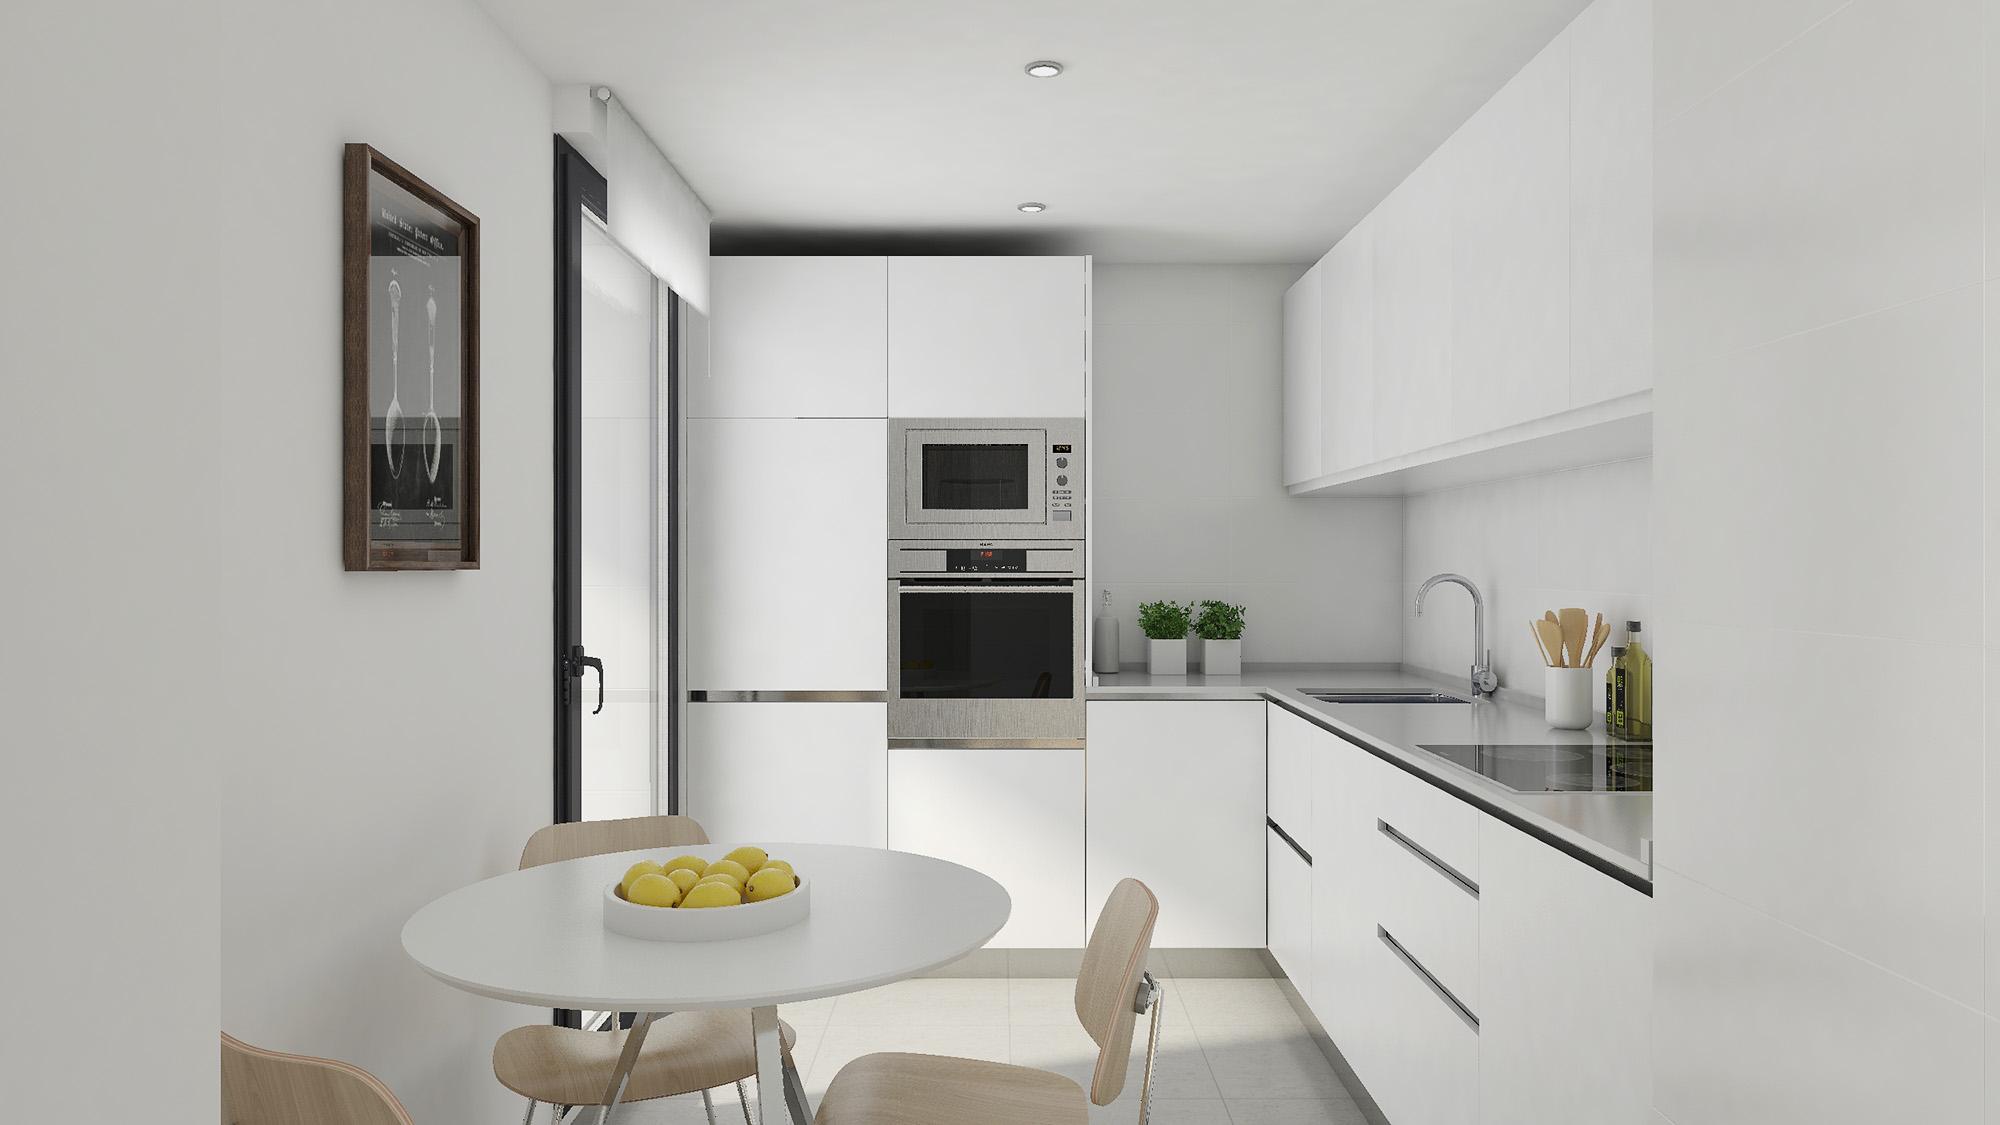 Artiberri-42-VPO-Galeria-cocina